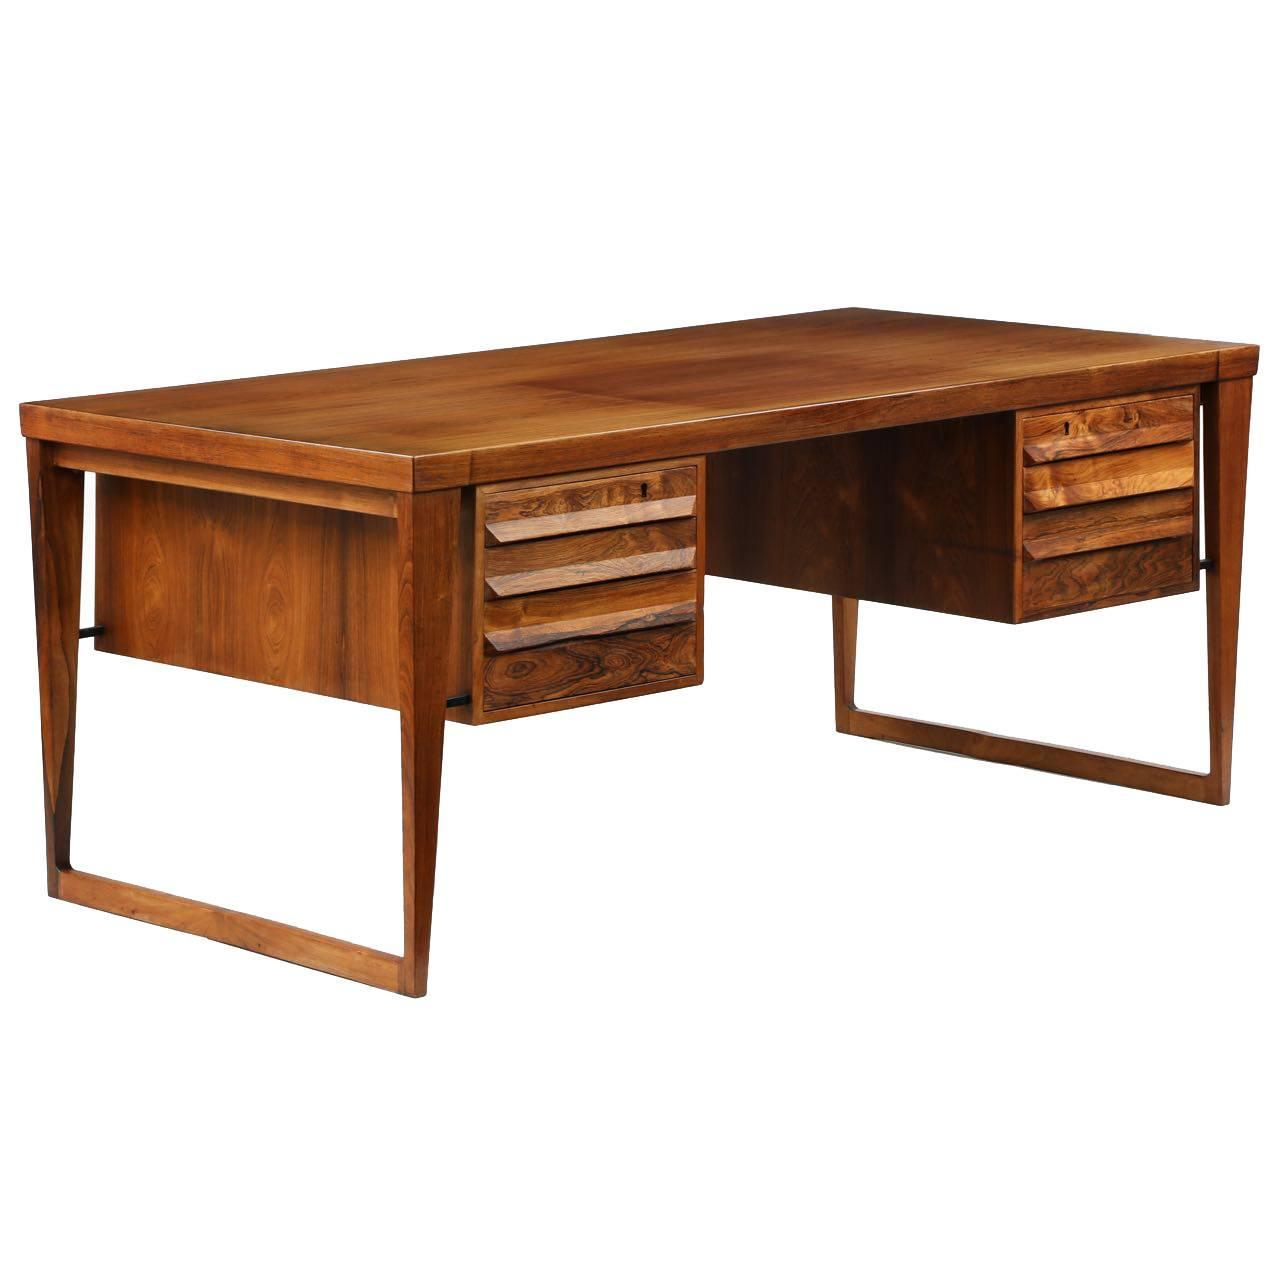 Mid Century Modern Desk: Danish Mid-Century Modern Teakwood Partners Desk At 1stdibs